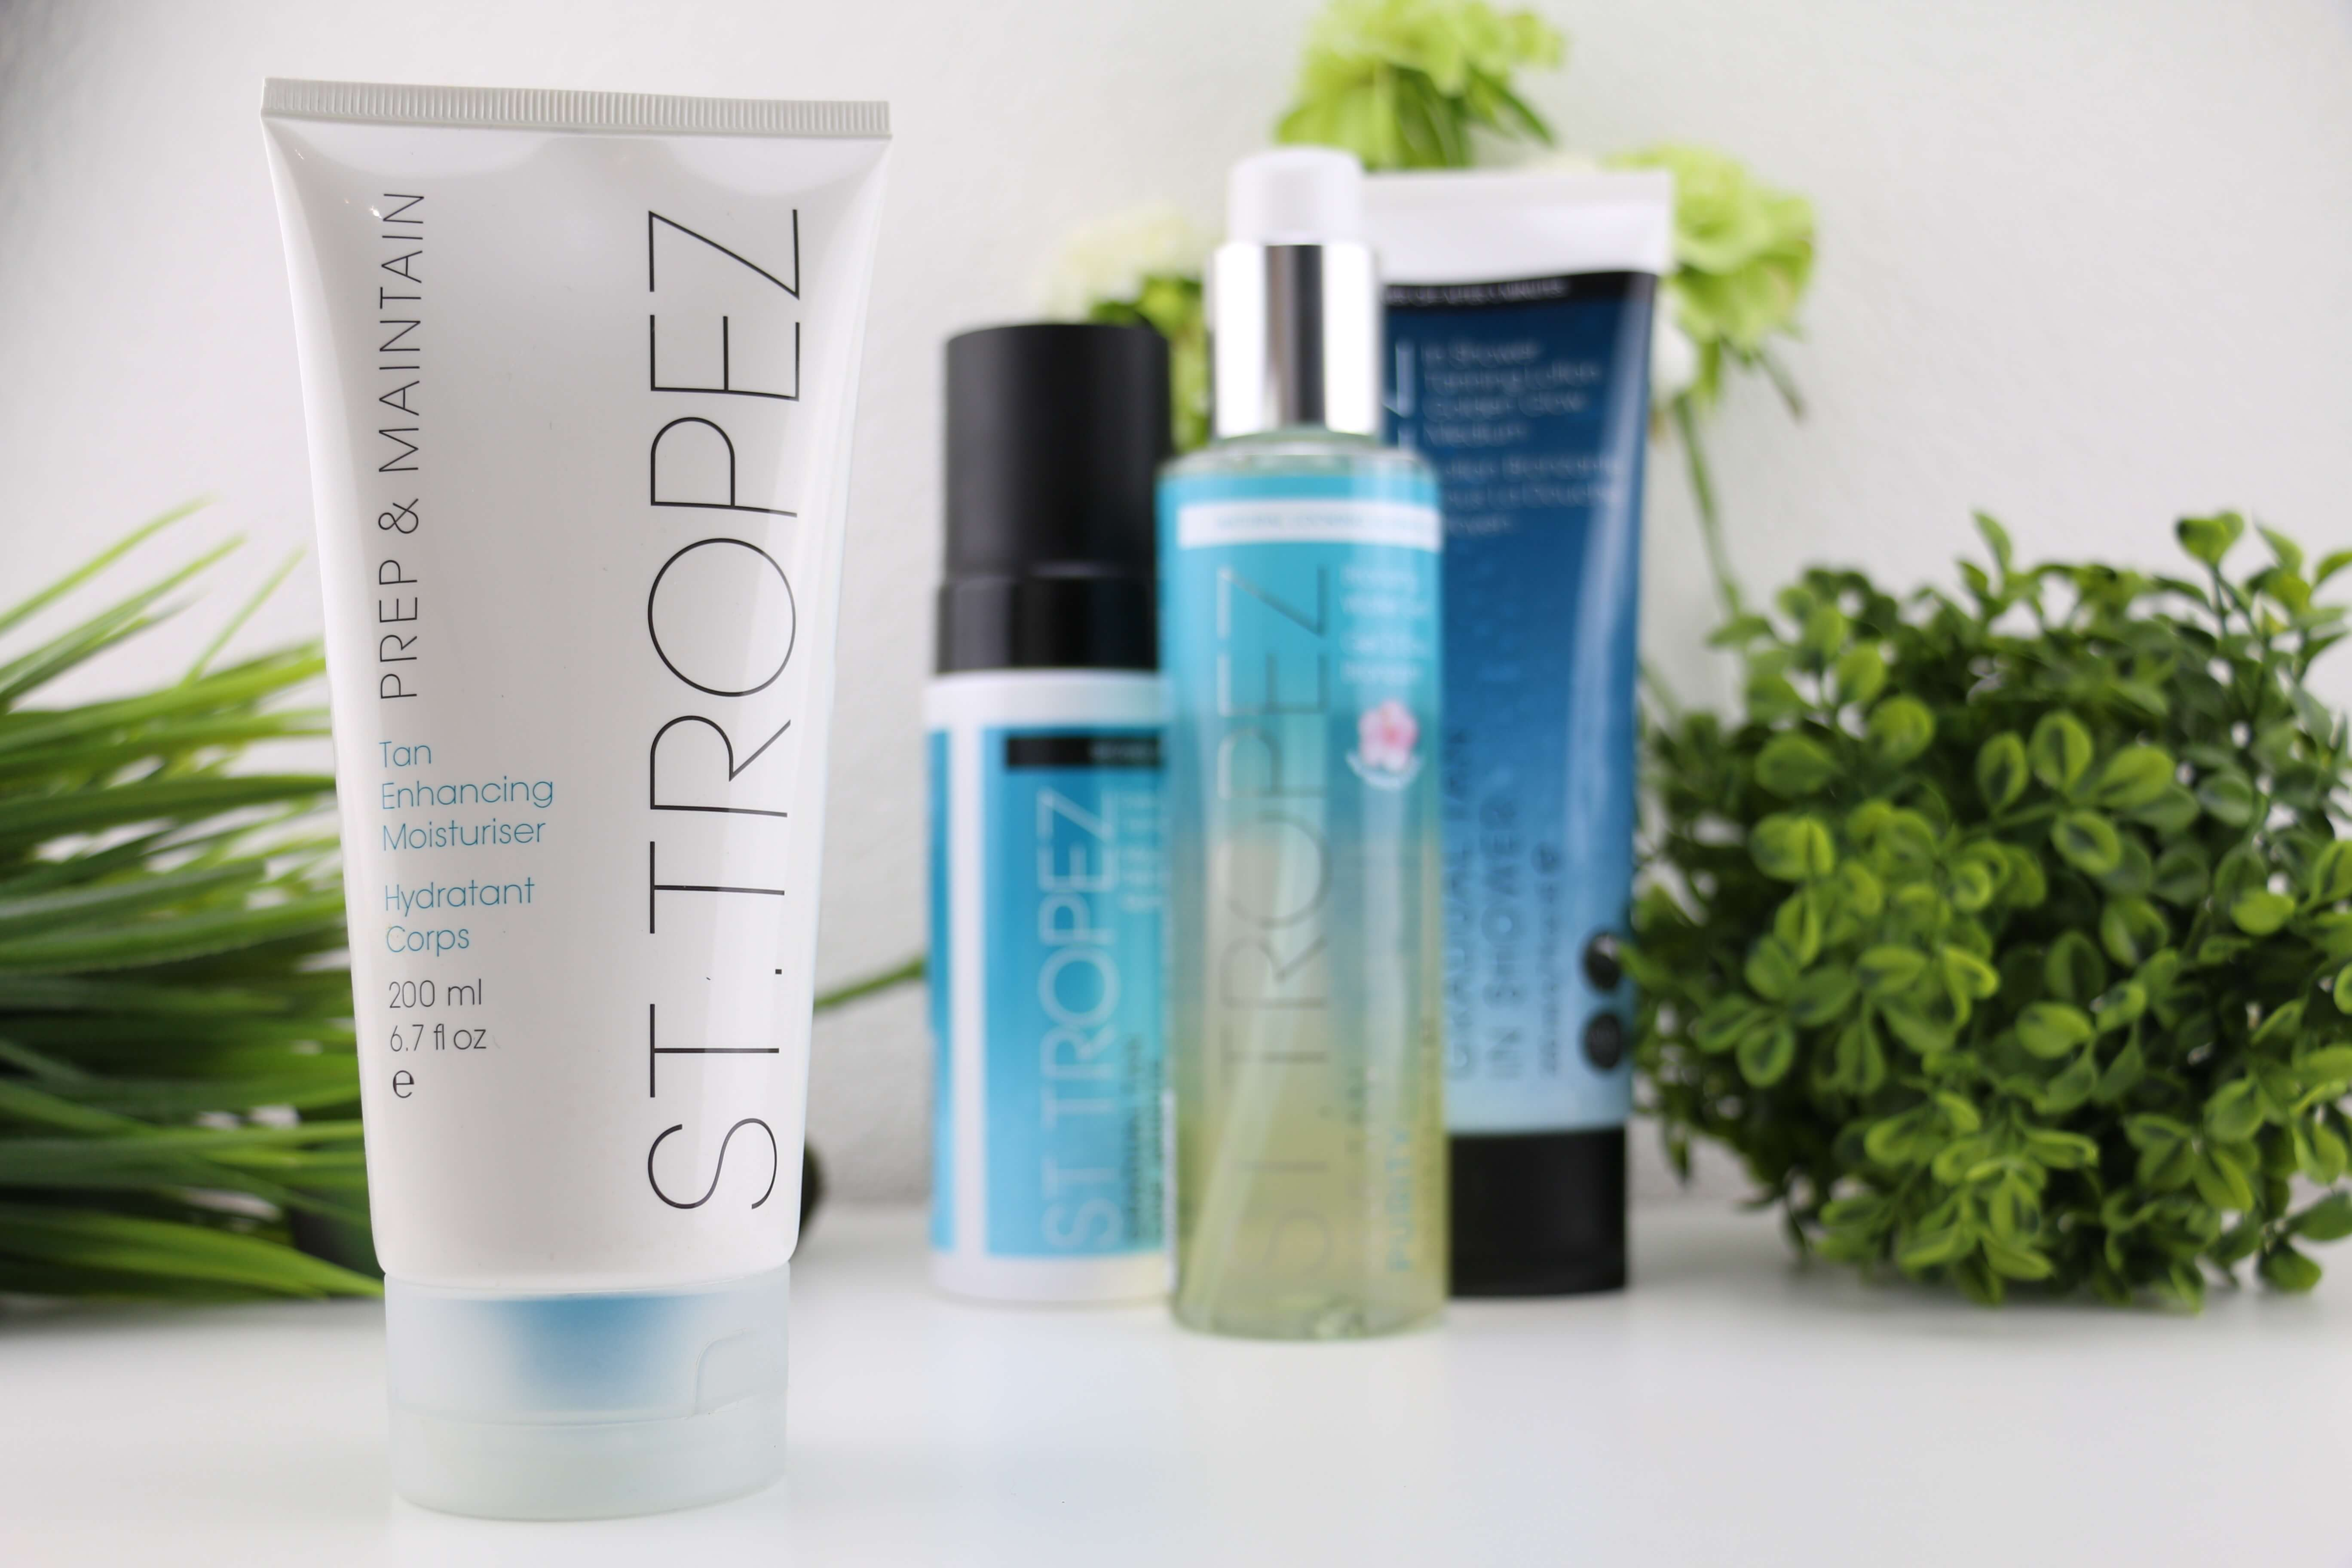 St-Tropez-Prep-Maintain-Tan-Enhancing-Moisturizer